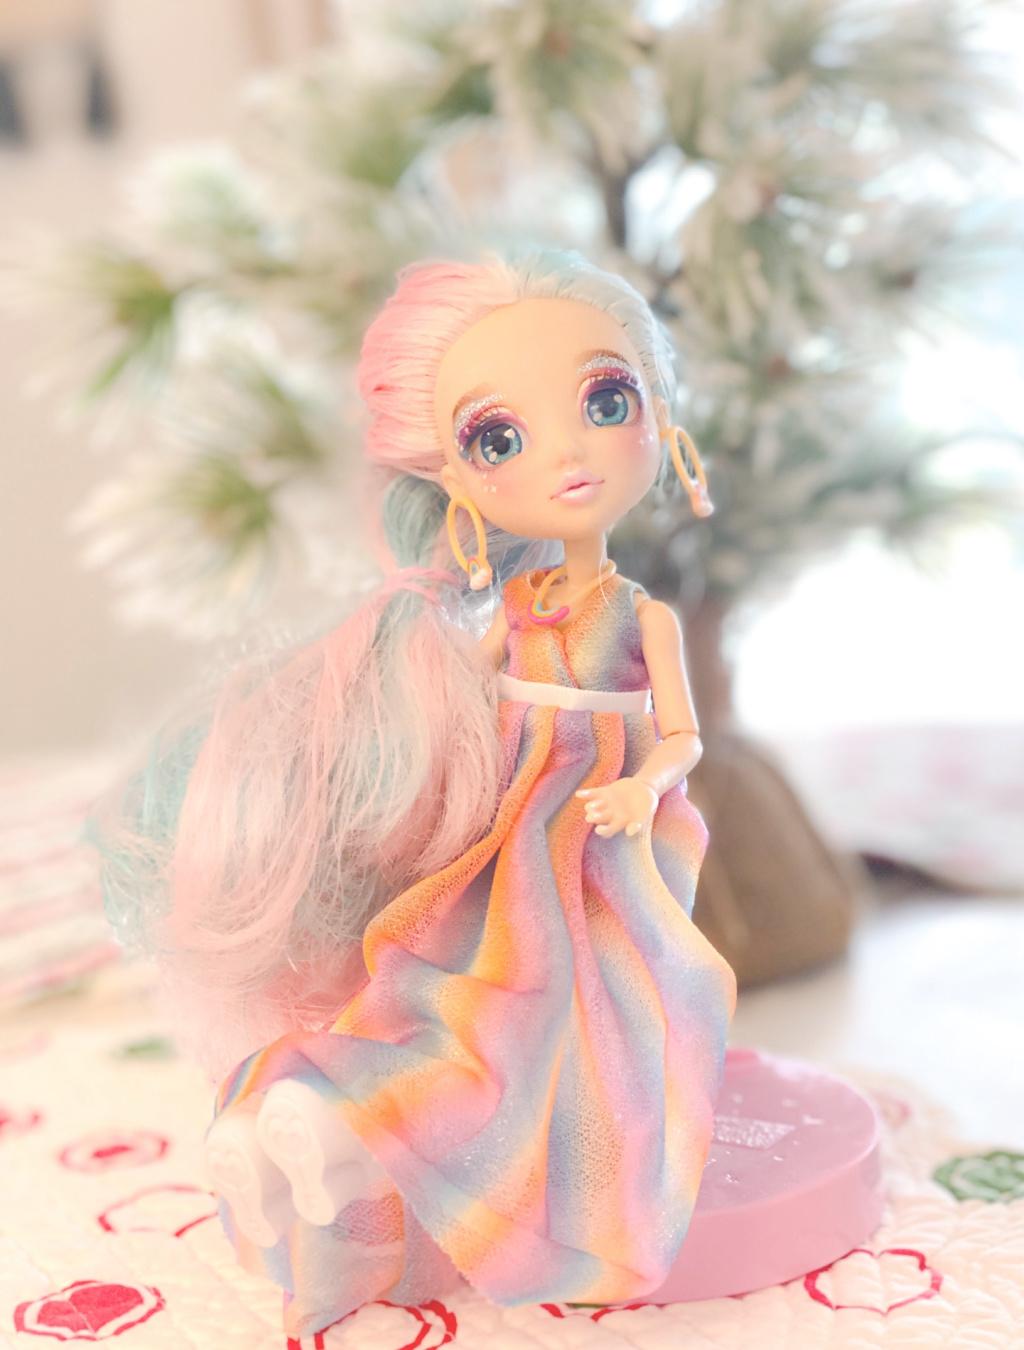 pink and blue 2dreami failfix doll